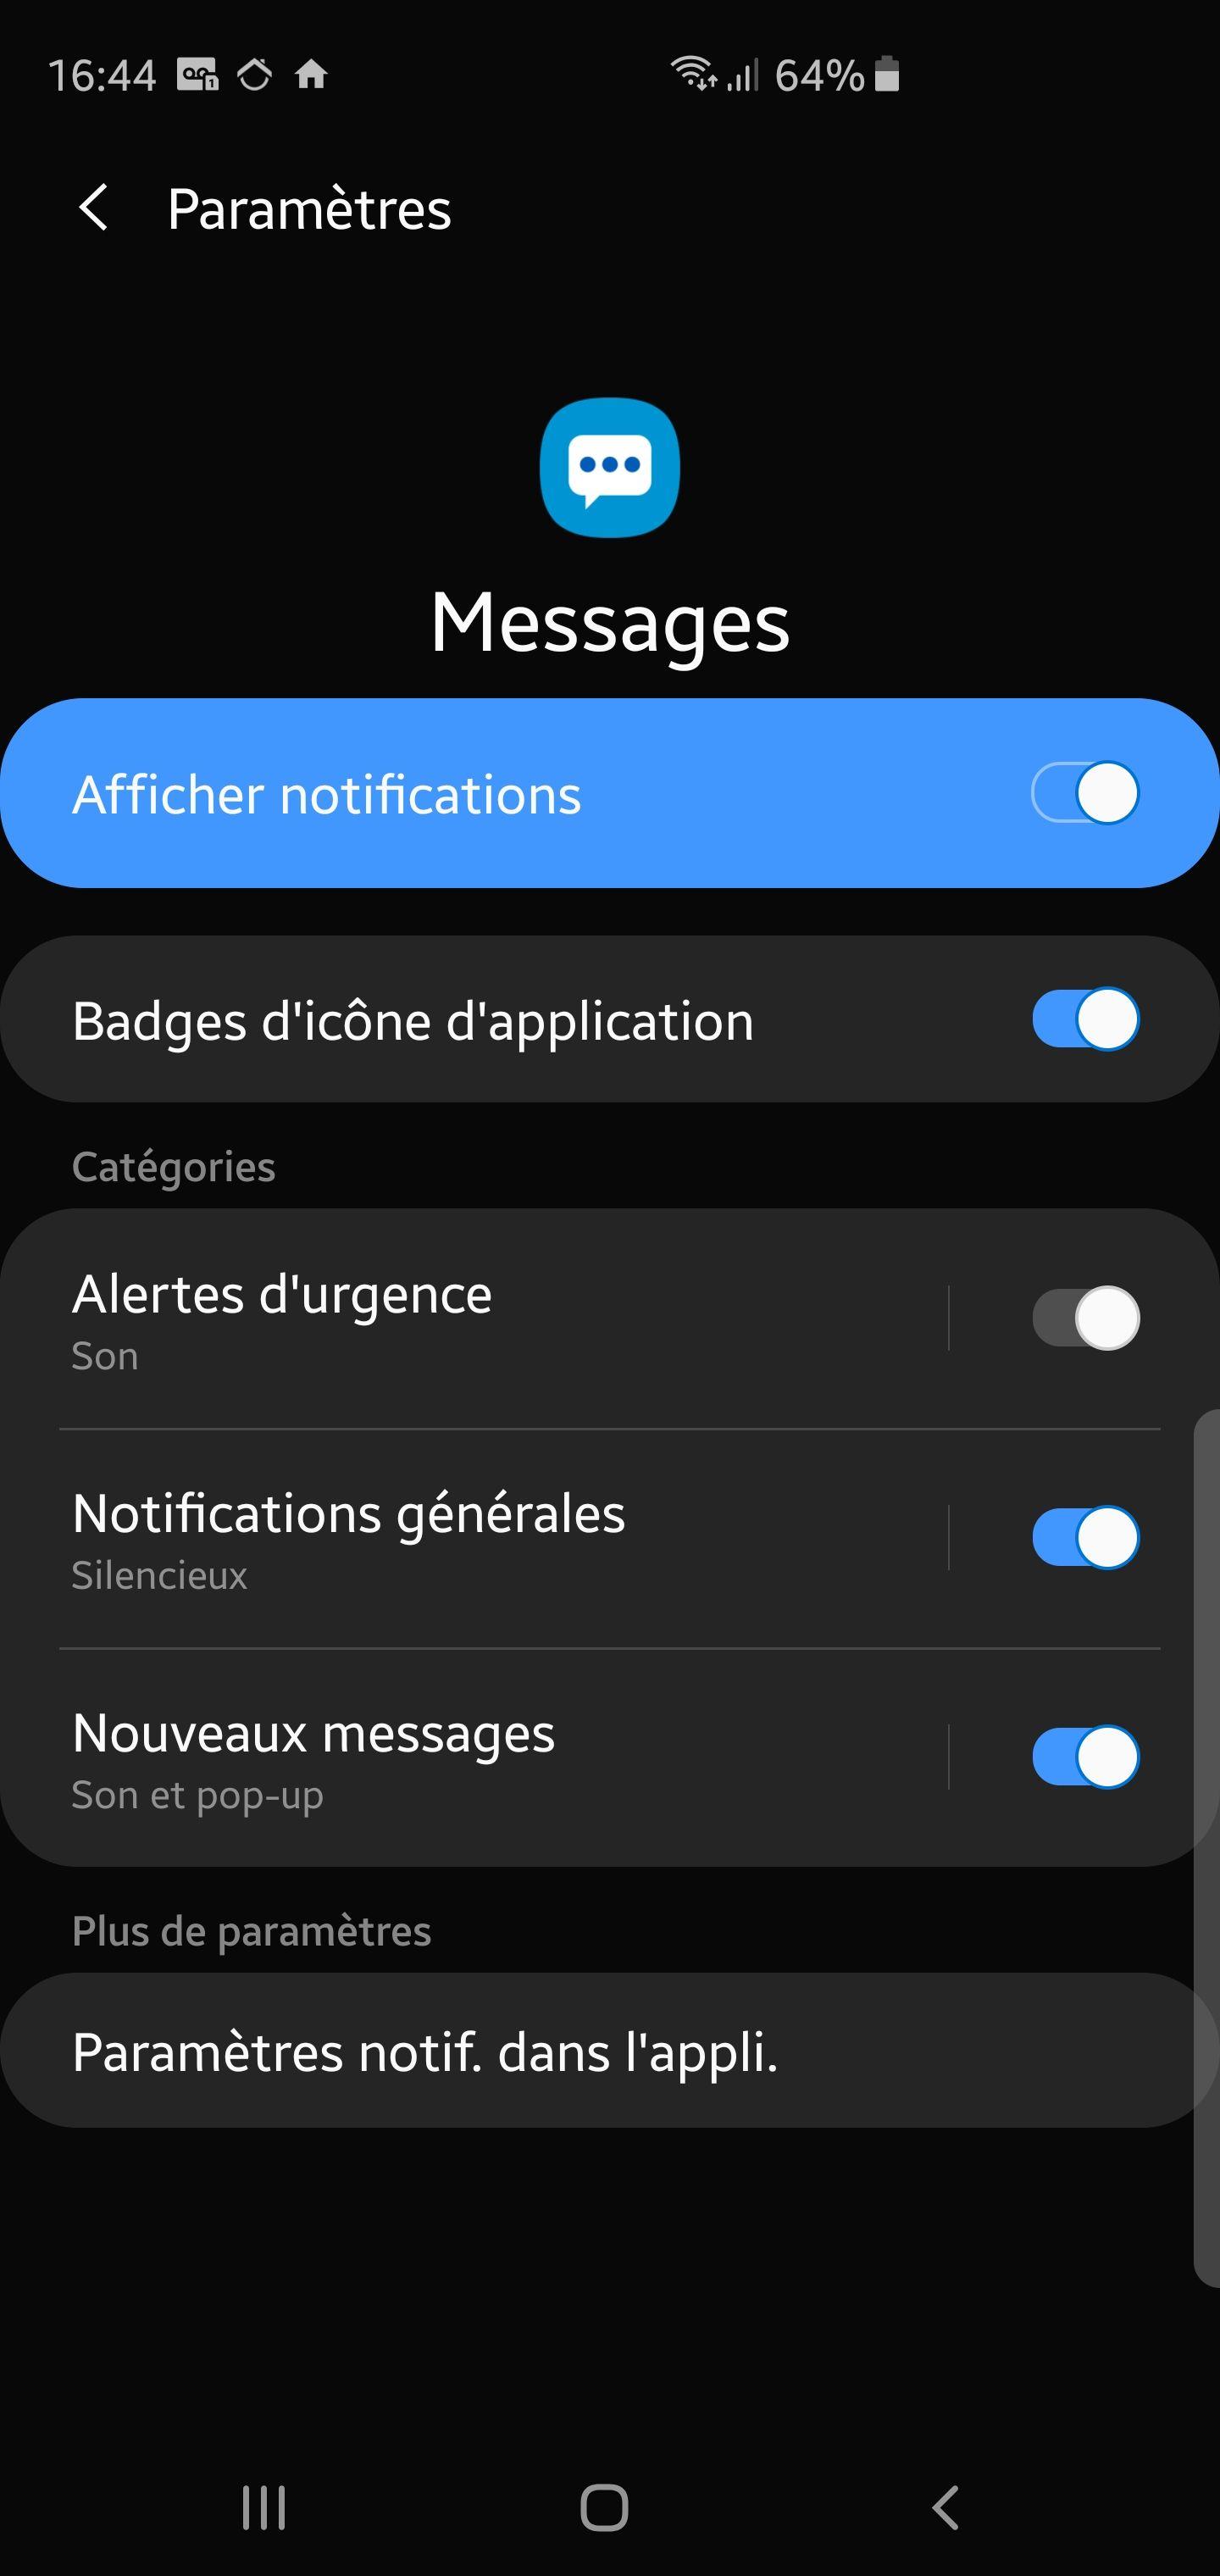 ALERTE SIFFLEMENT SAMSUNG TÉLÉCHARGER SMS